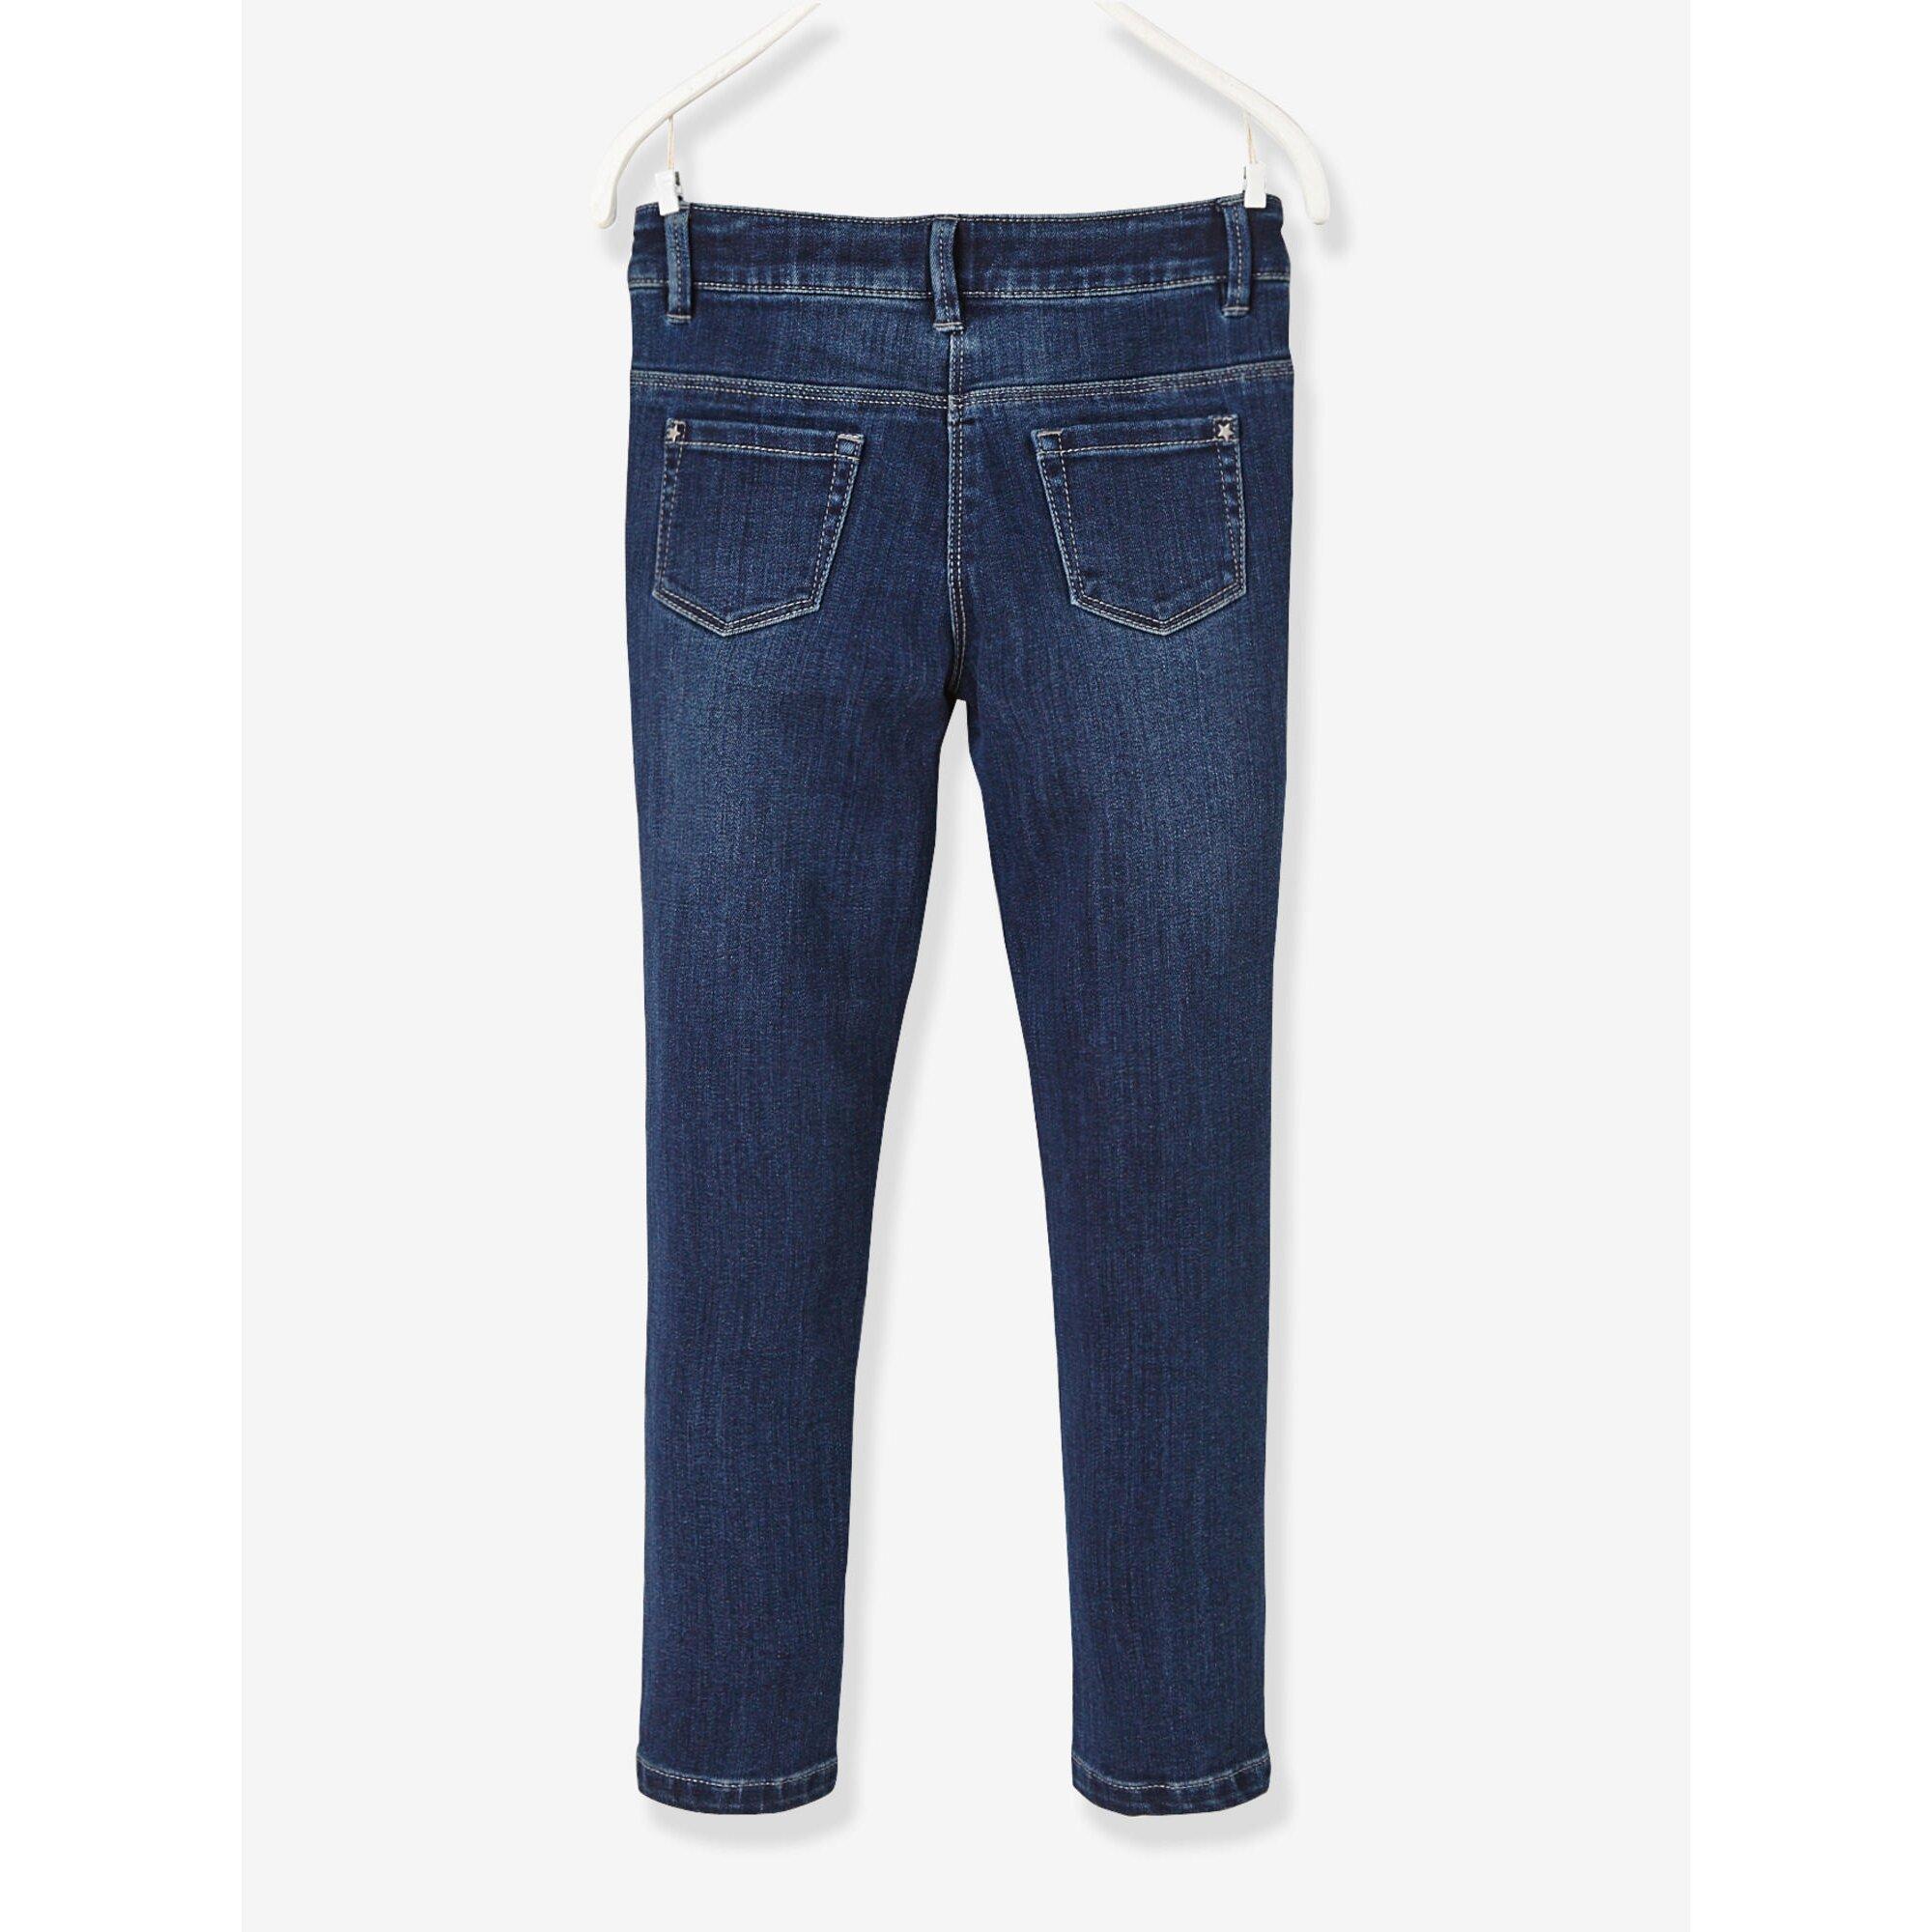 vertbaudet-stretch-jeans-fur-madchen-huftweite-regular, 23.99 EUR @ babywalz-de